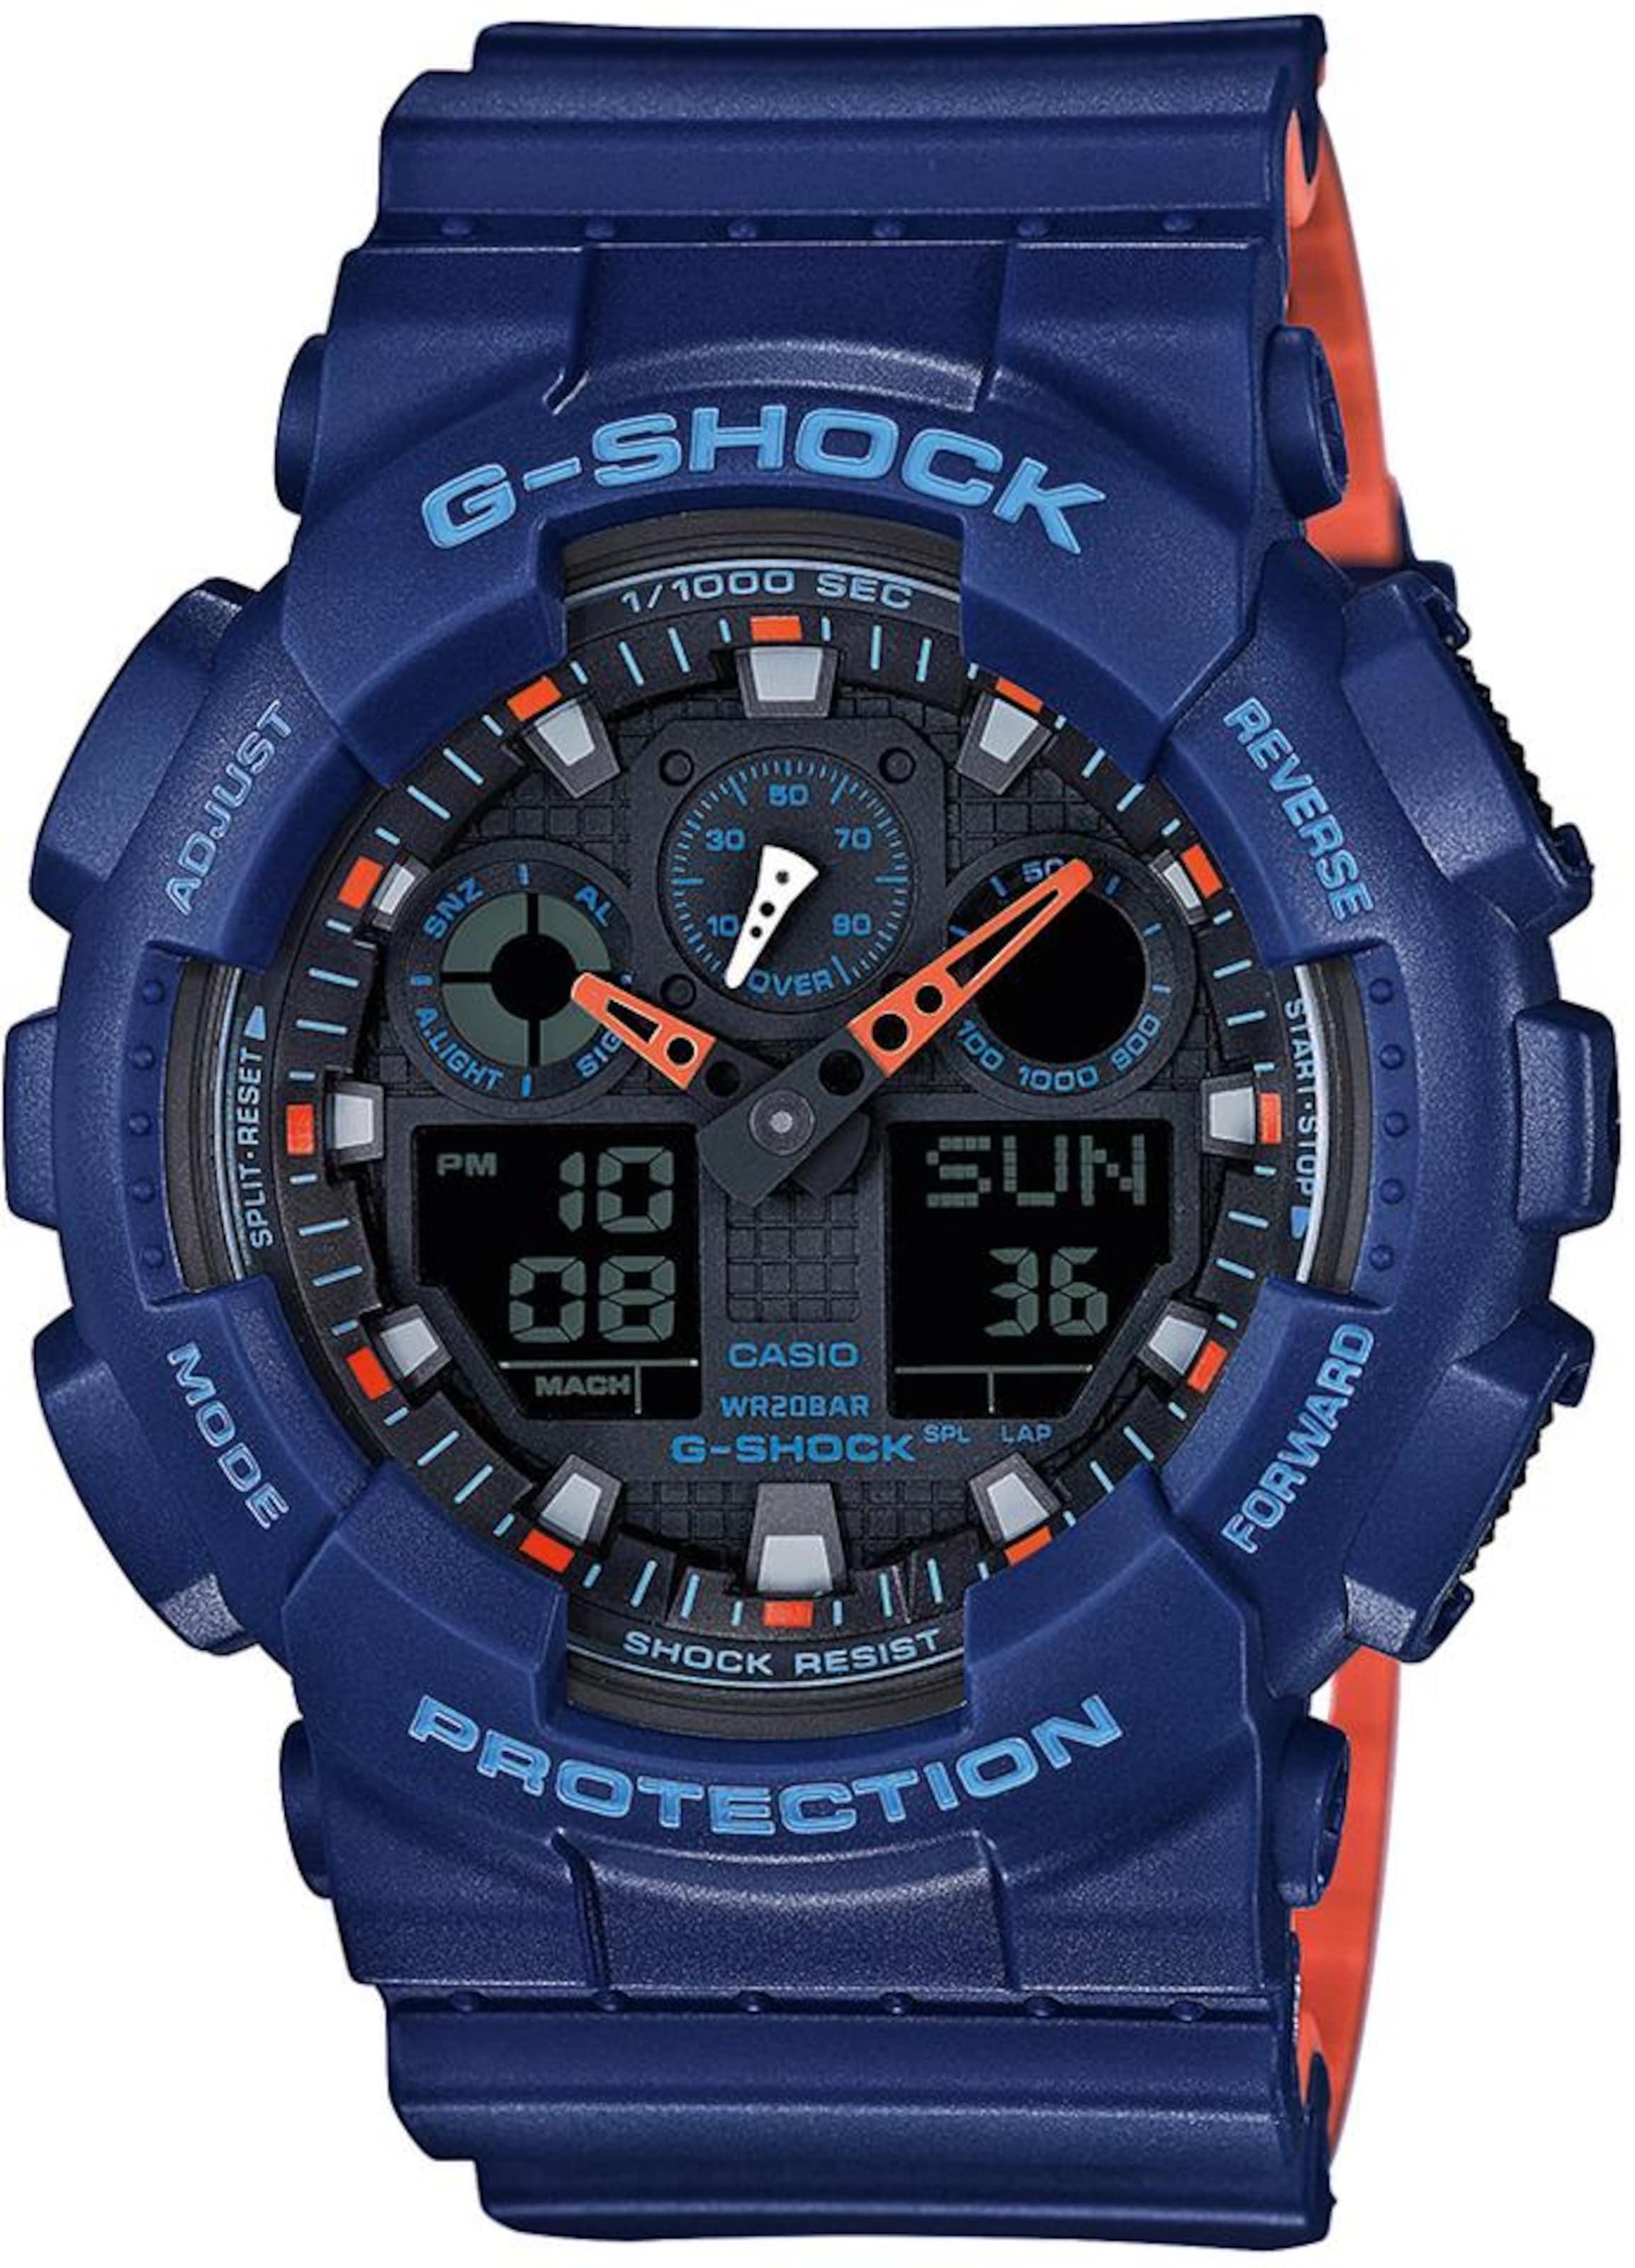 CASIO G-Shock Chronograph Nicekicks Rabatt Bester Verkauf Freies Verschiffen Große Diskont Limit Rabatt VJmTVEHIx